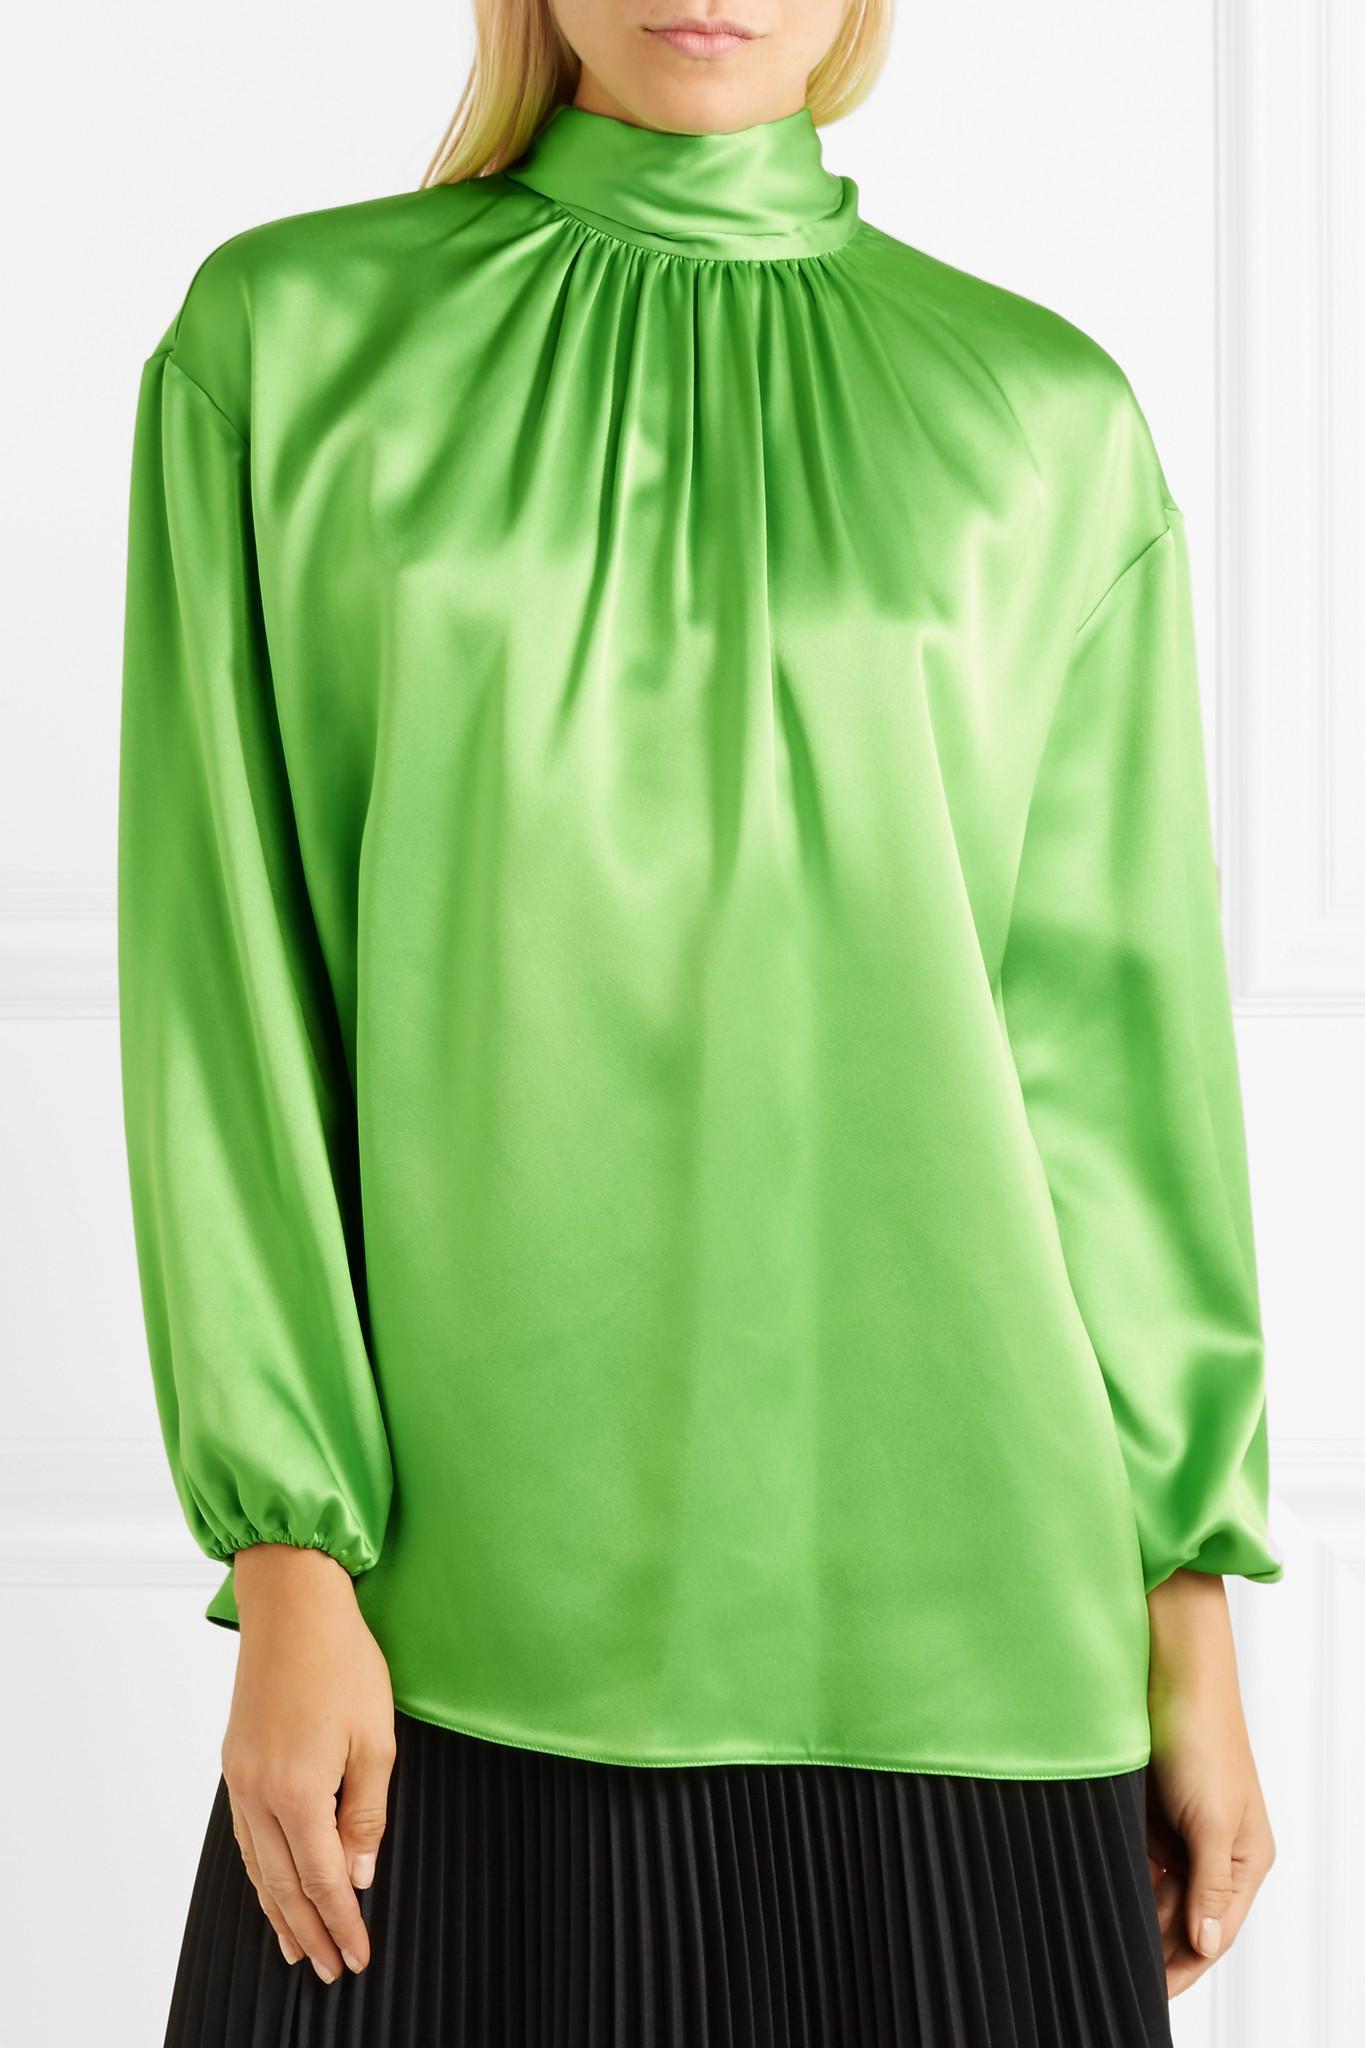 c1fc60313e019 Prada - Green Gathered Neon Silk-satin Blouse - Lyst. View fullscreen